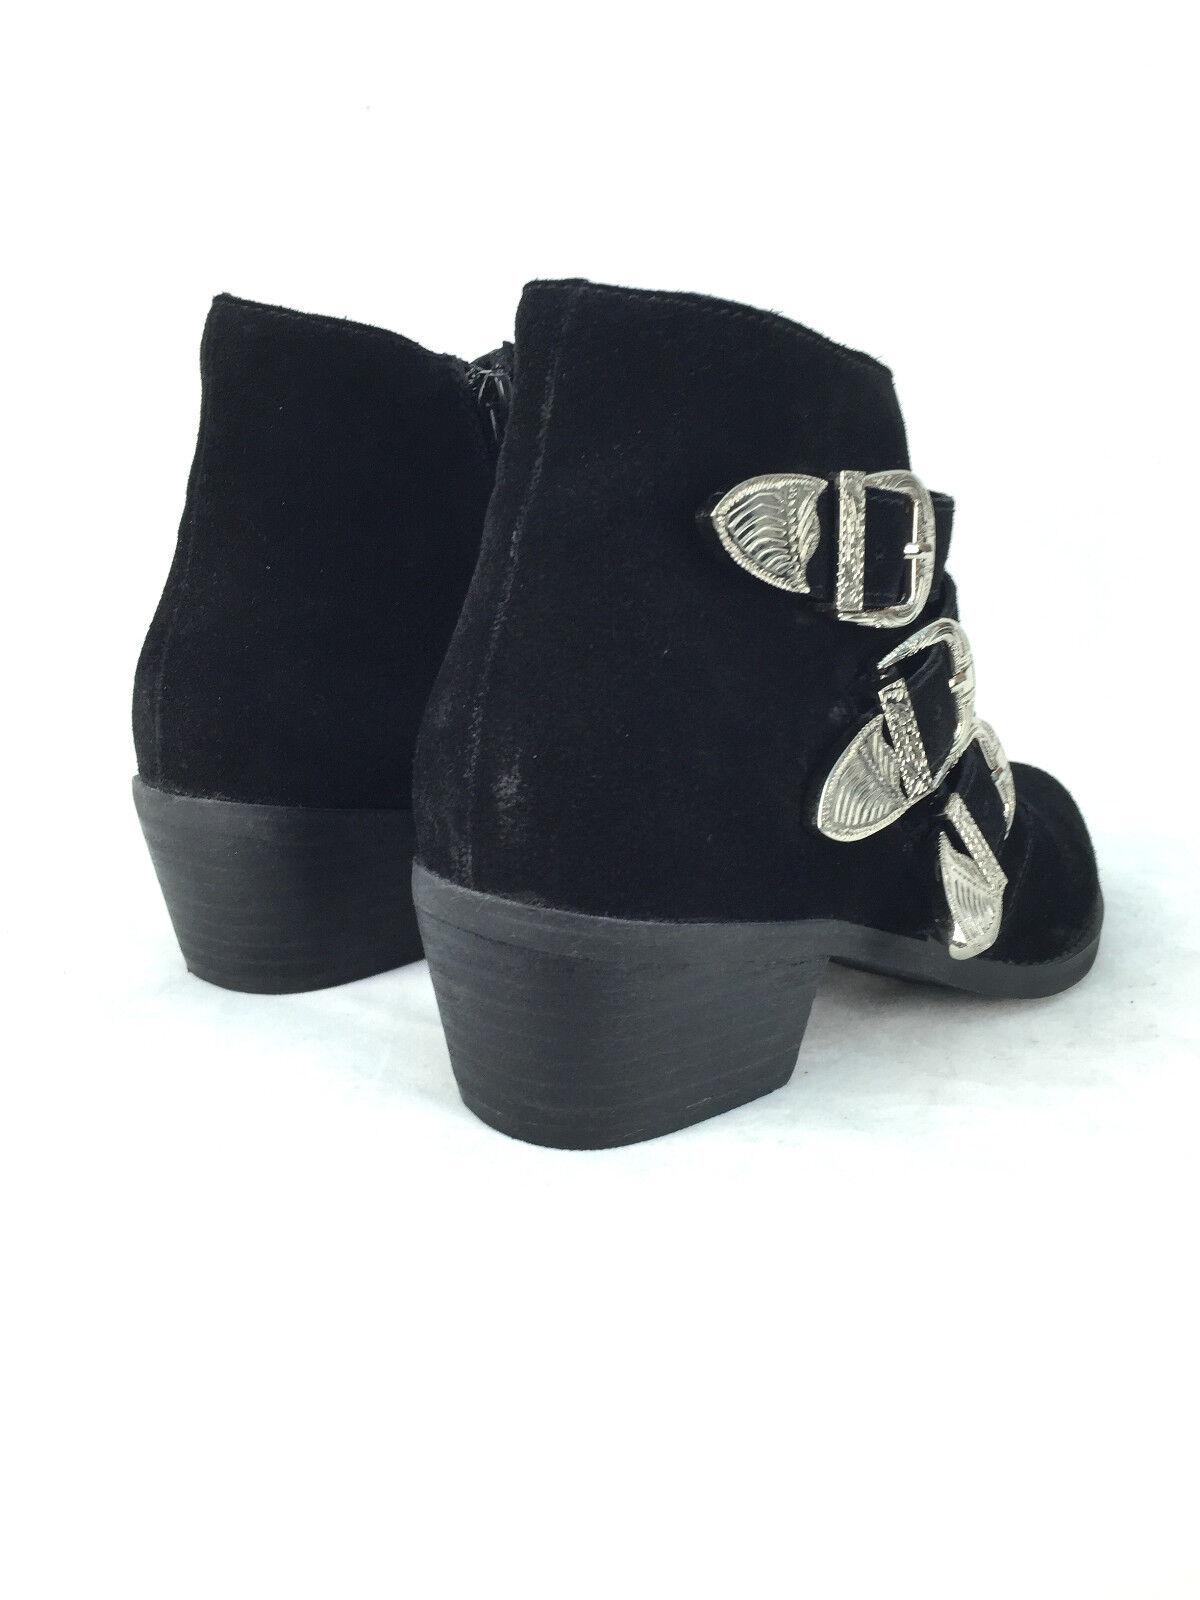 Mujer Botines Botines Mujer Estilo Motero Zapatos Talla UK4 Eur37 Us6.5 be37b6